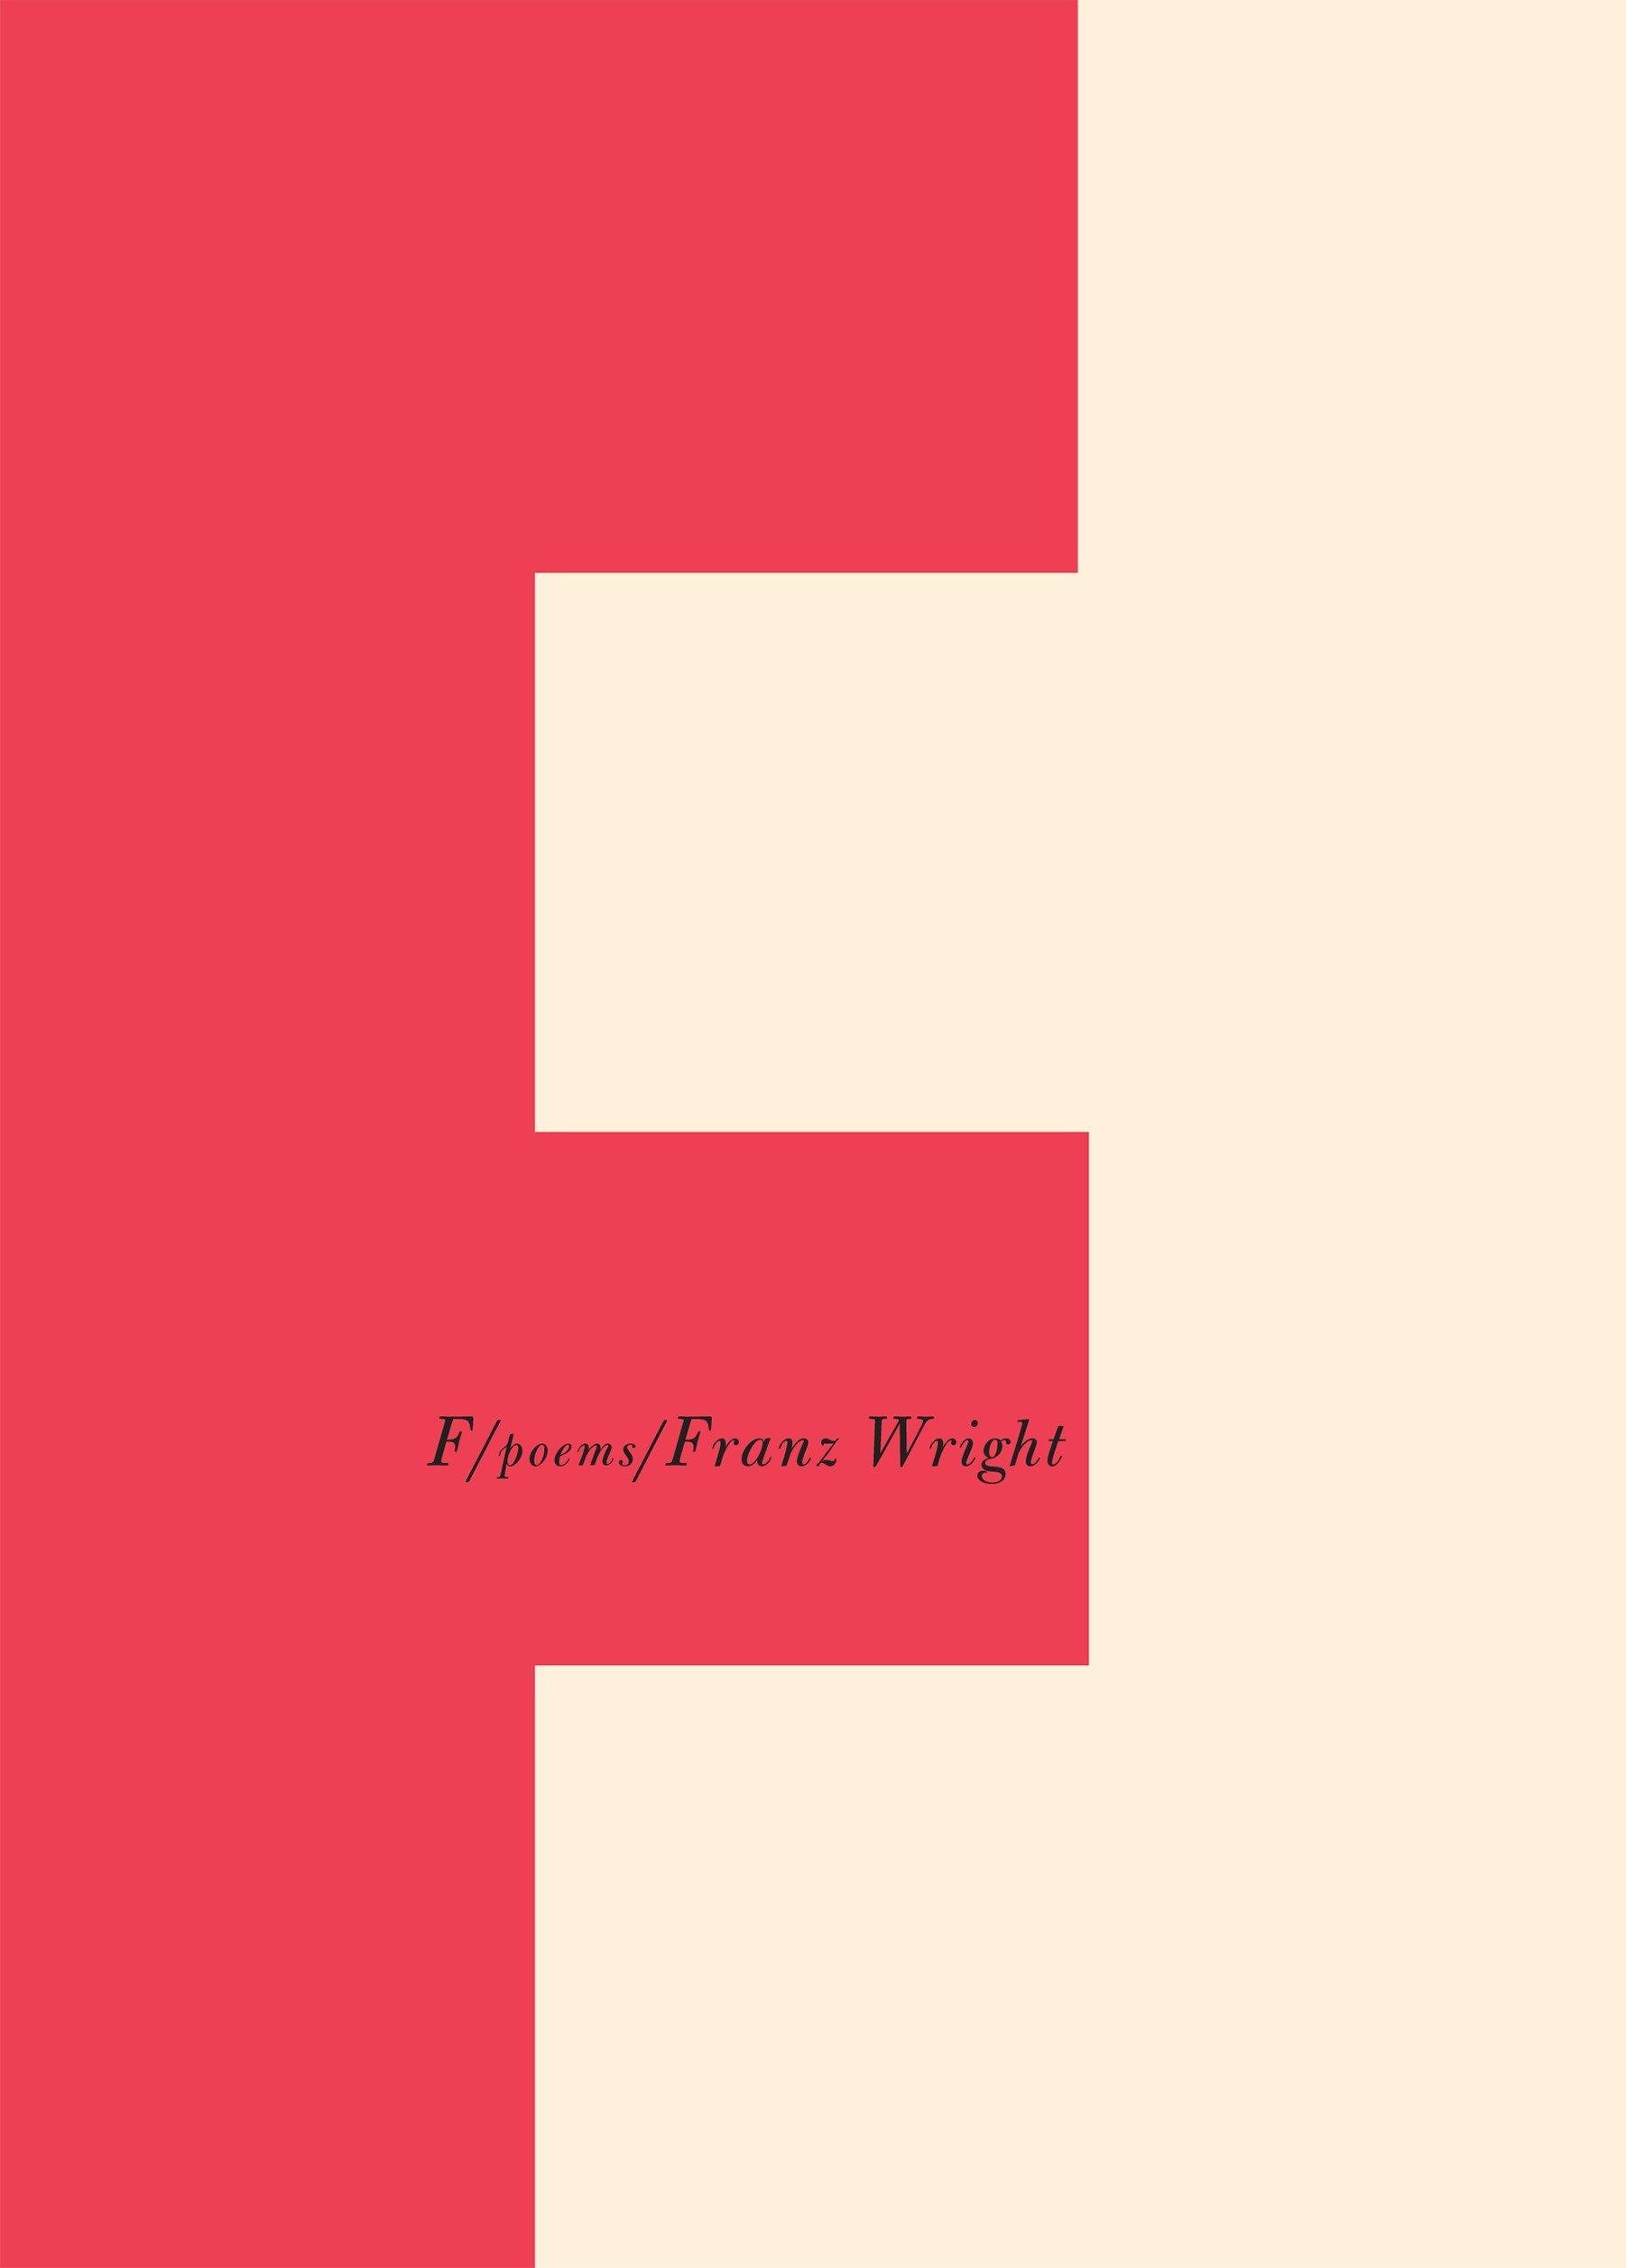 F: Poems: Franz Wright: 9780375712159: Amazon.com: Books